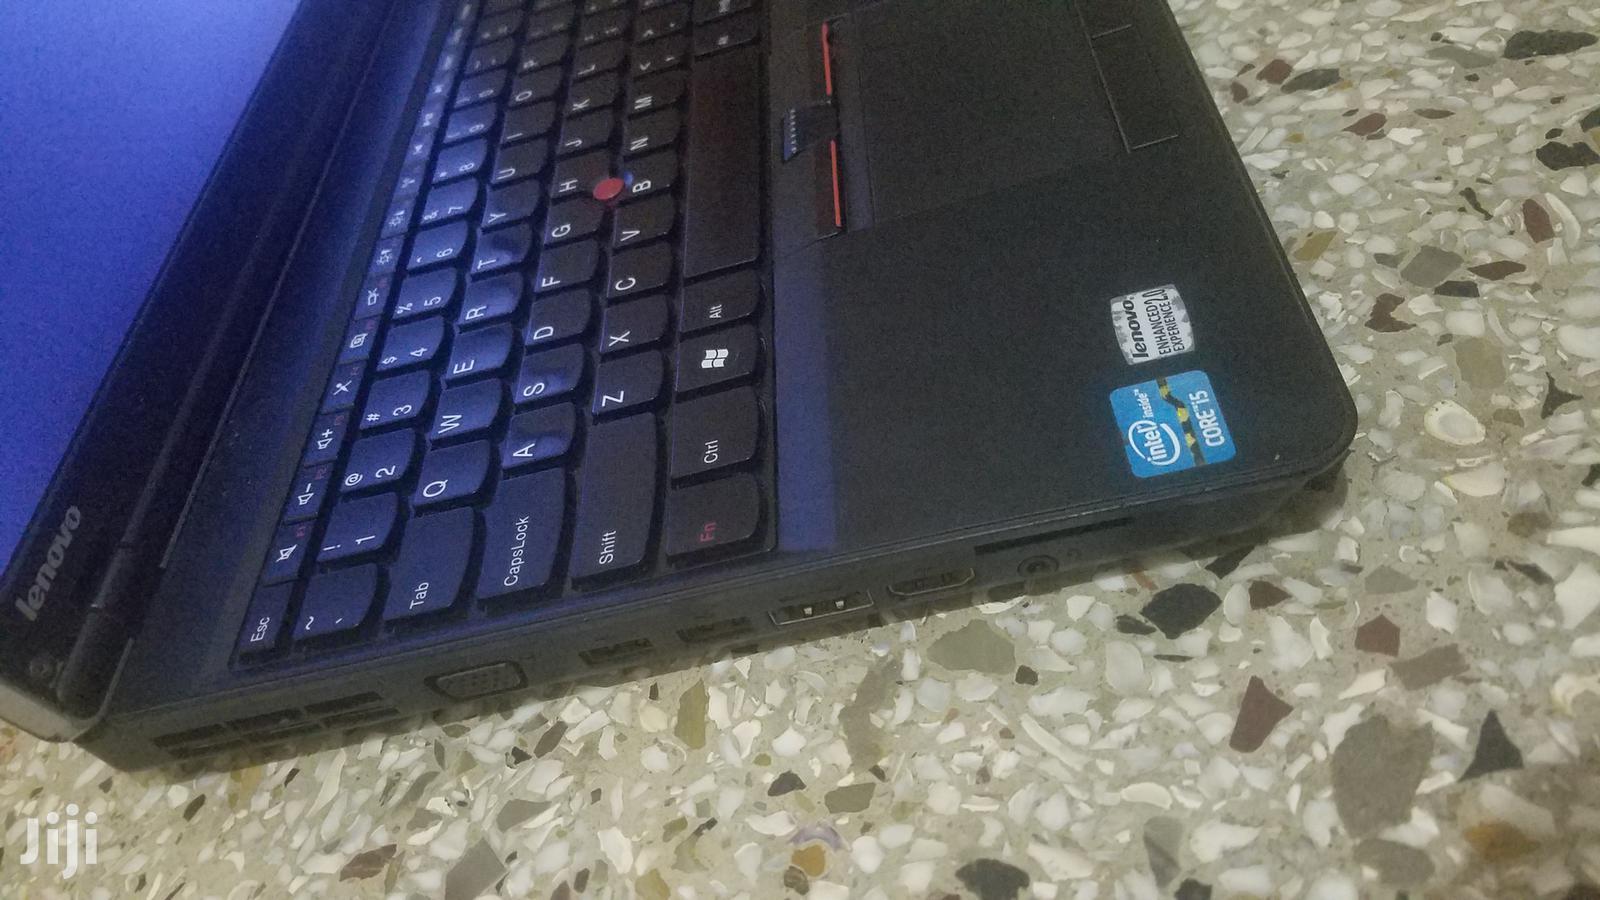 Archive: Laptop Lenovo ThinkPad Edge E520 6GB Intel Core I5 HDD 320GB